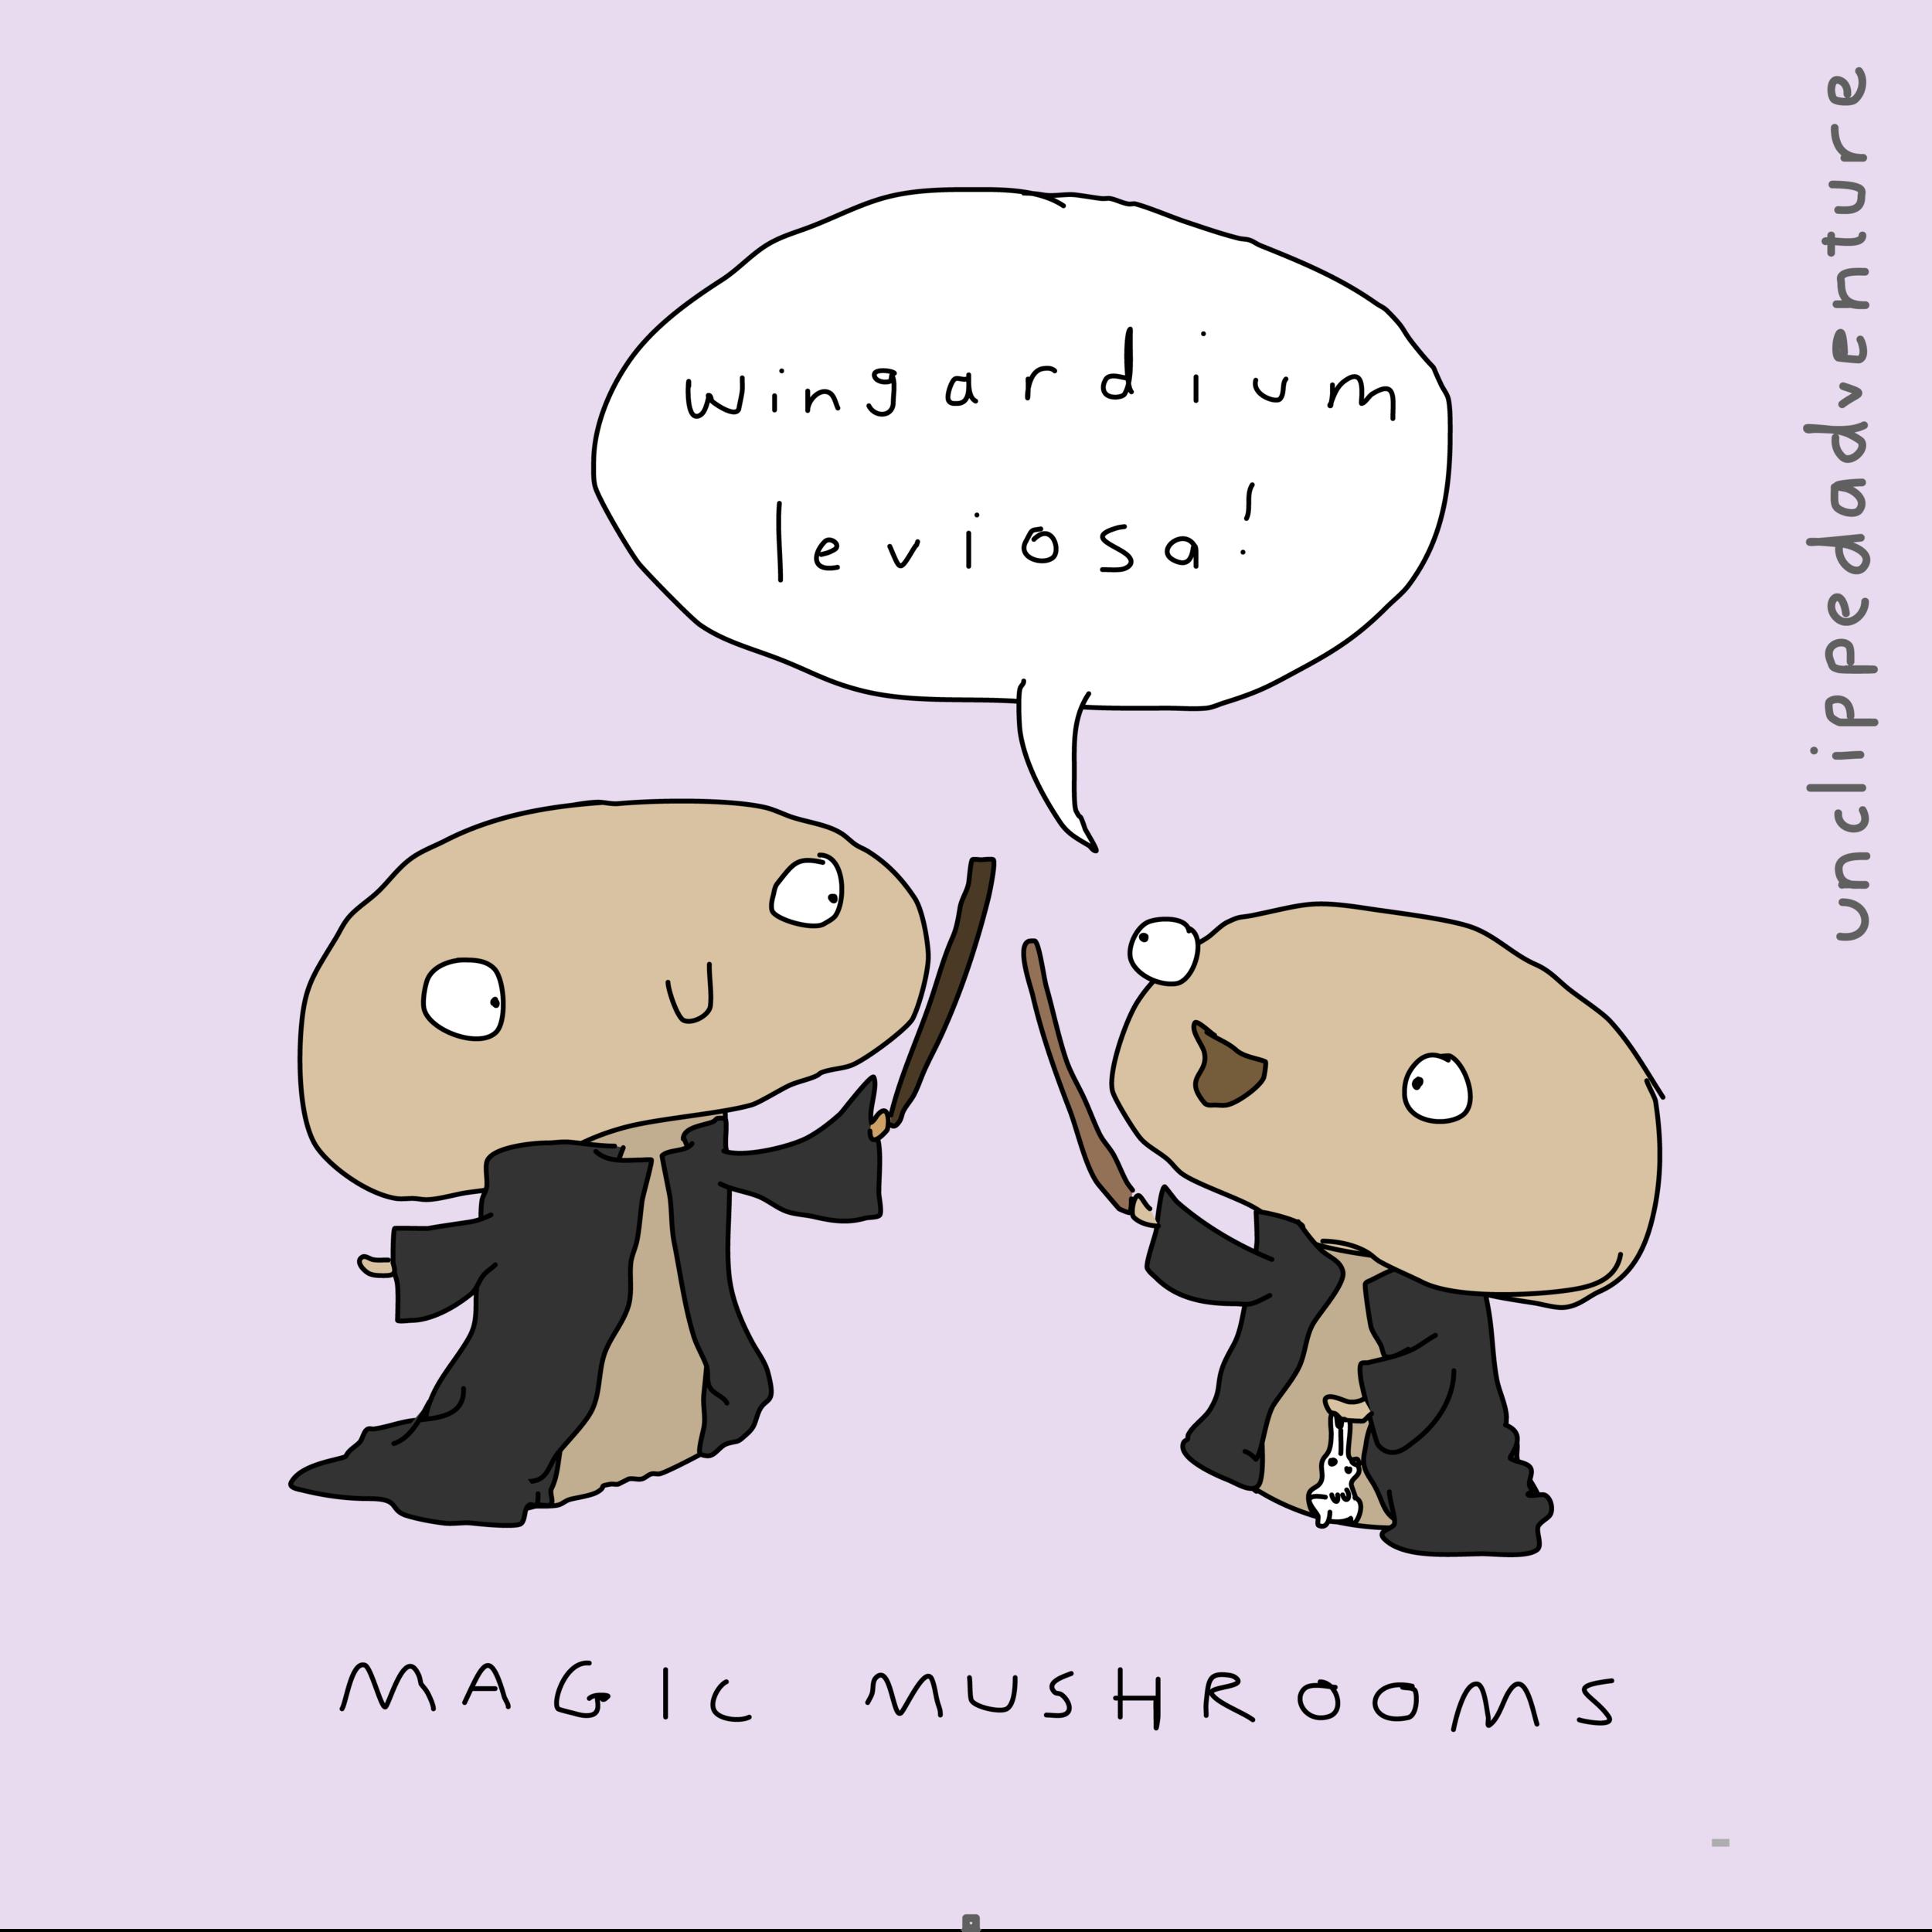 magic mushrooms-09.png